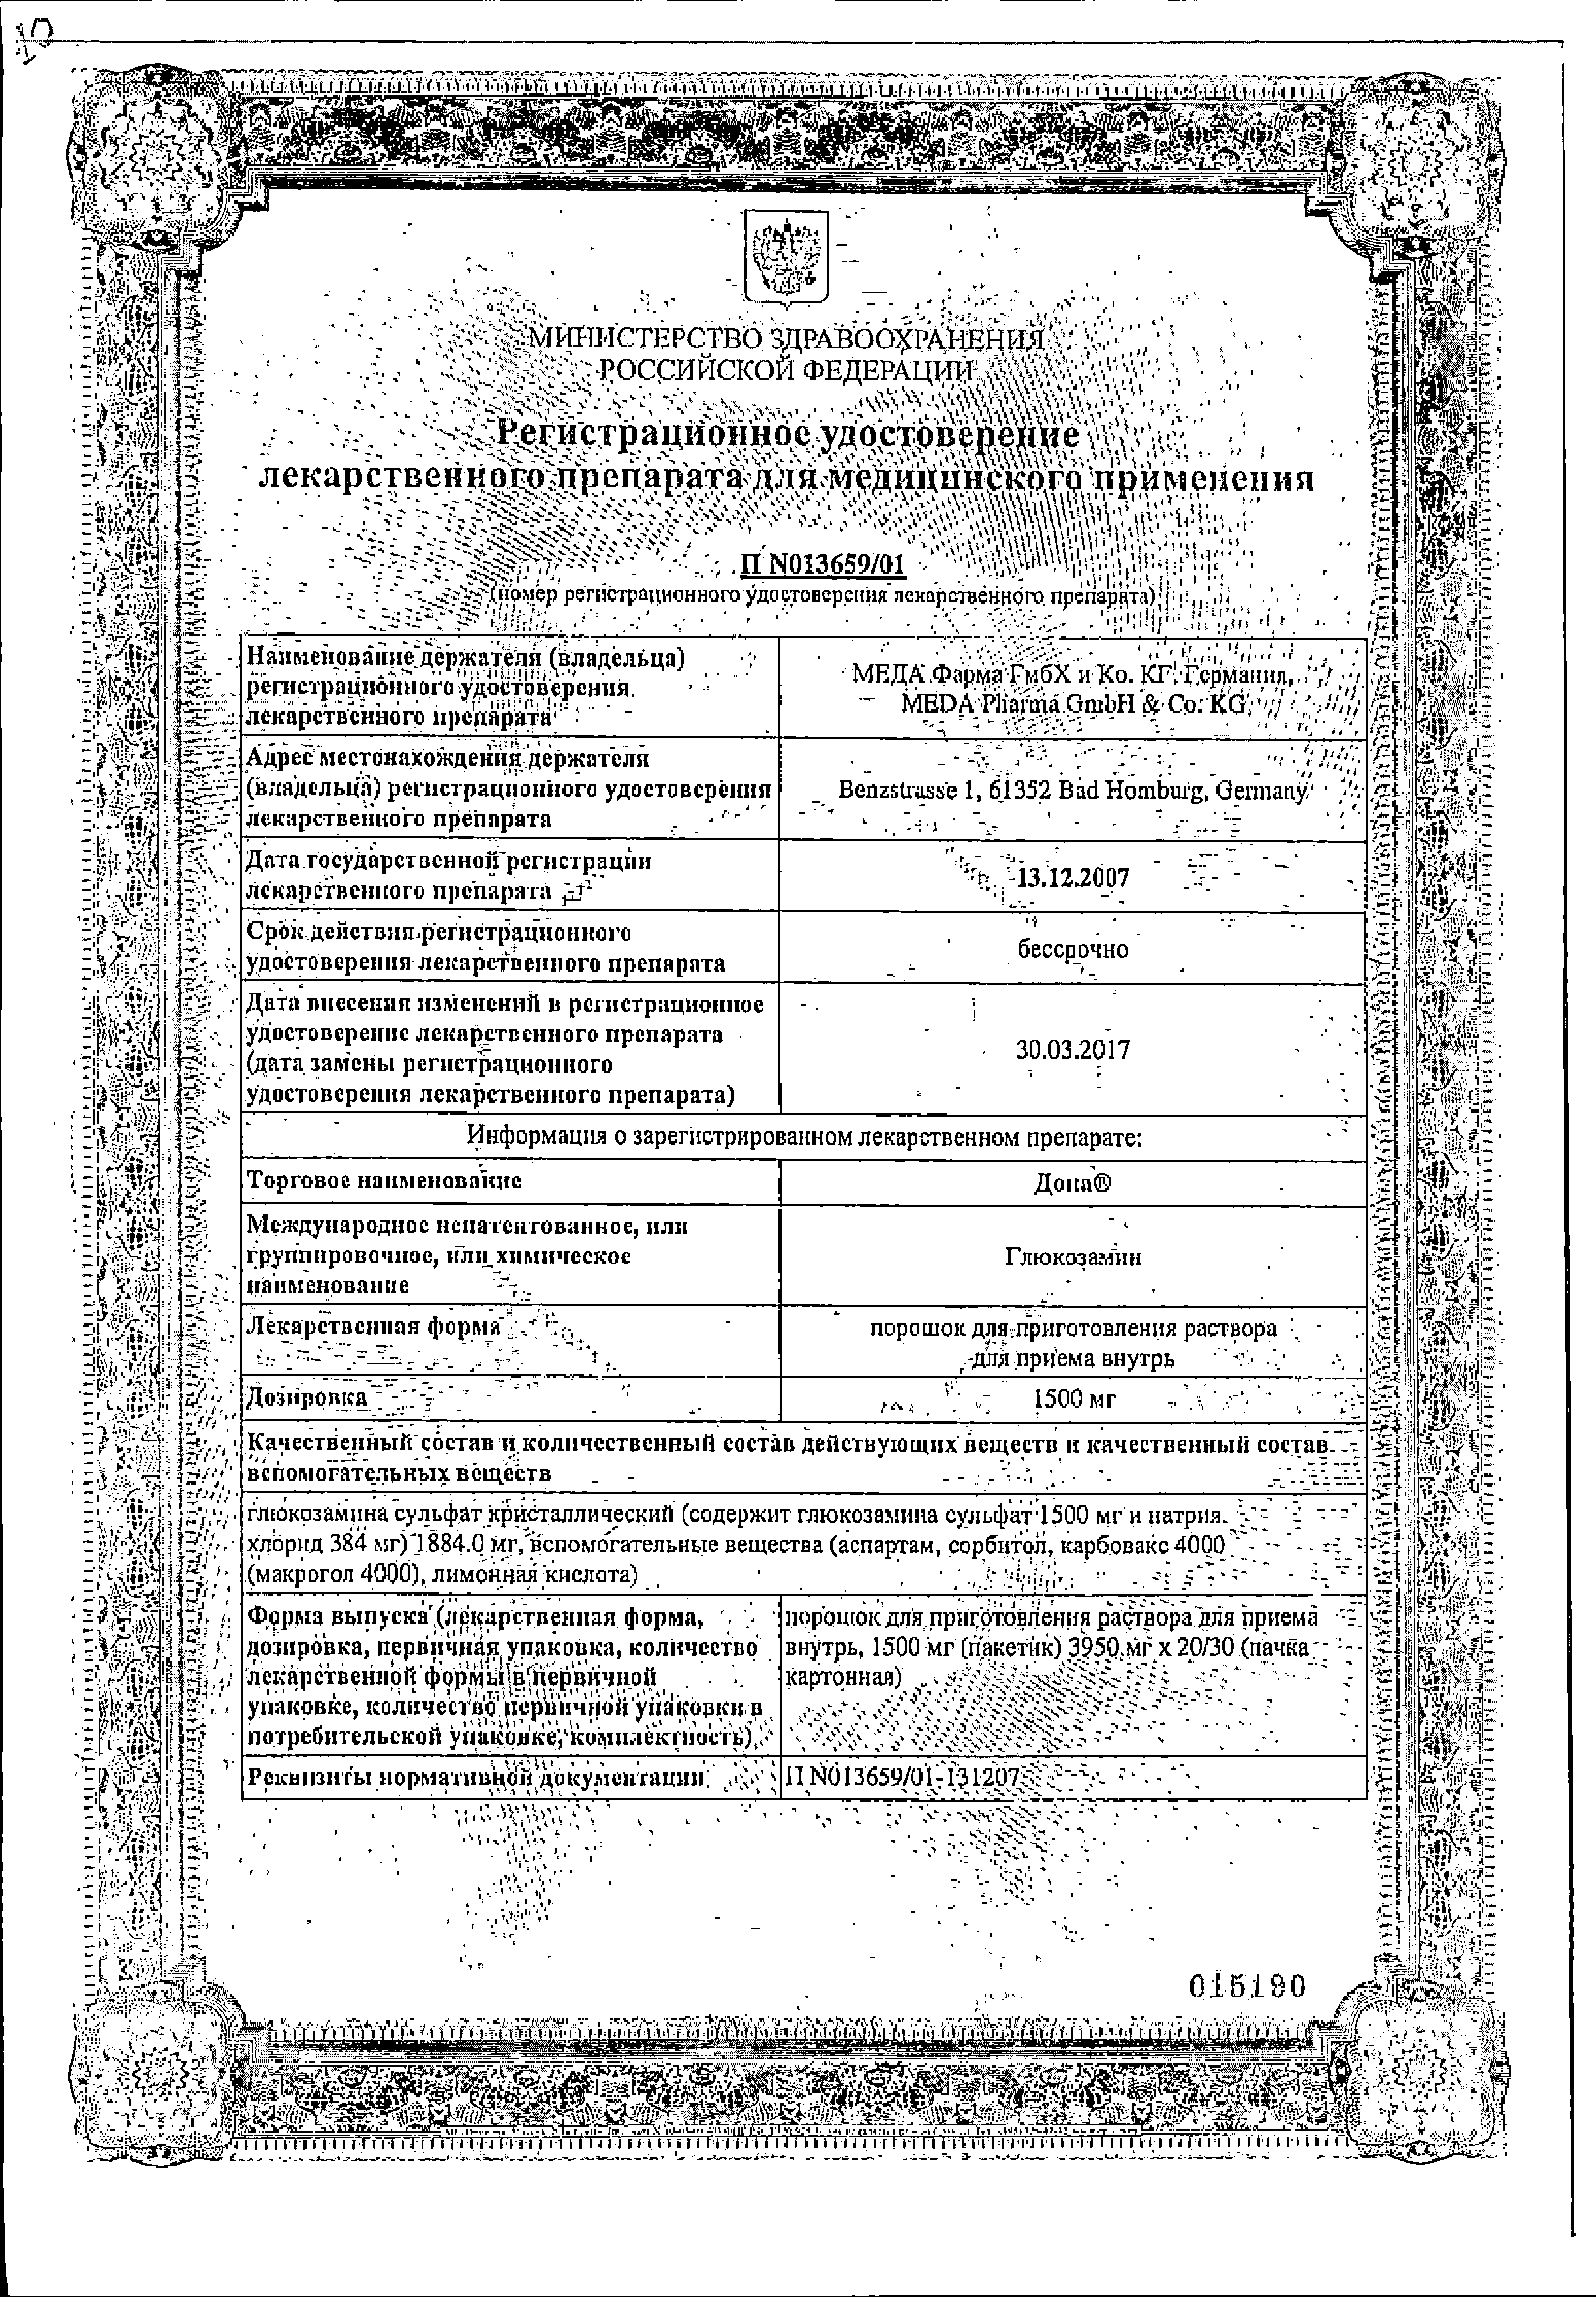 Дона сертификат